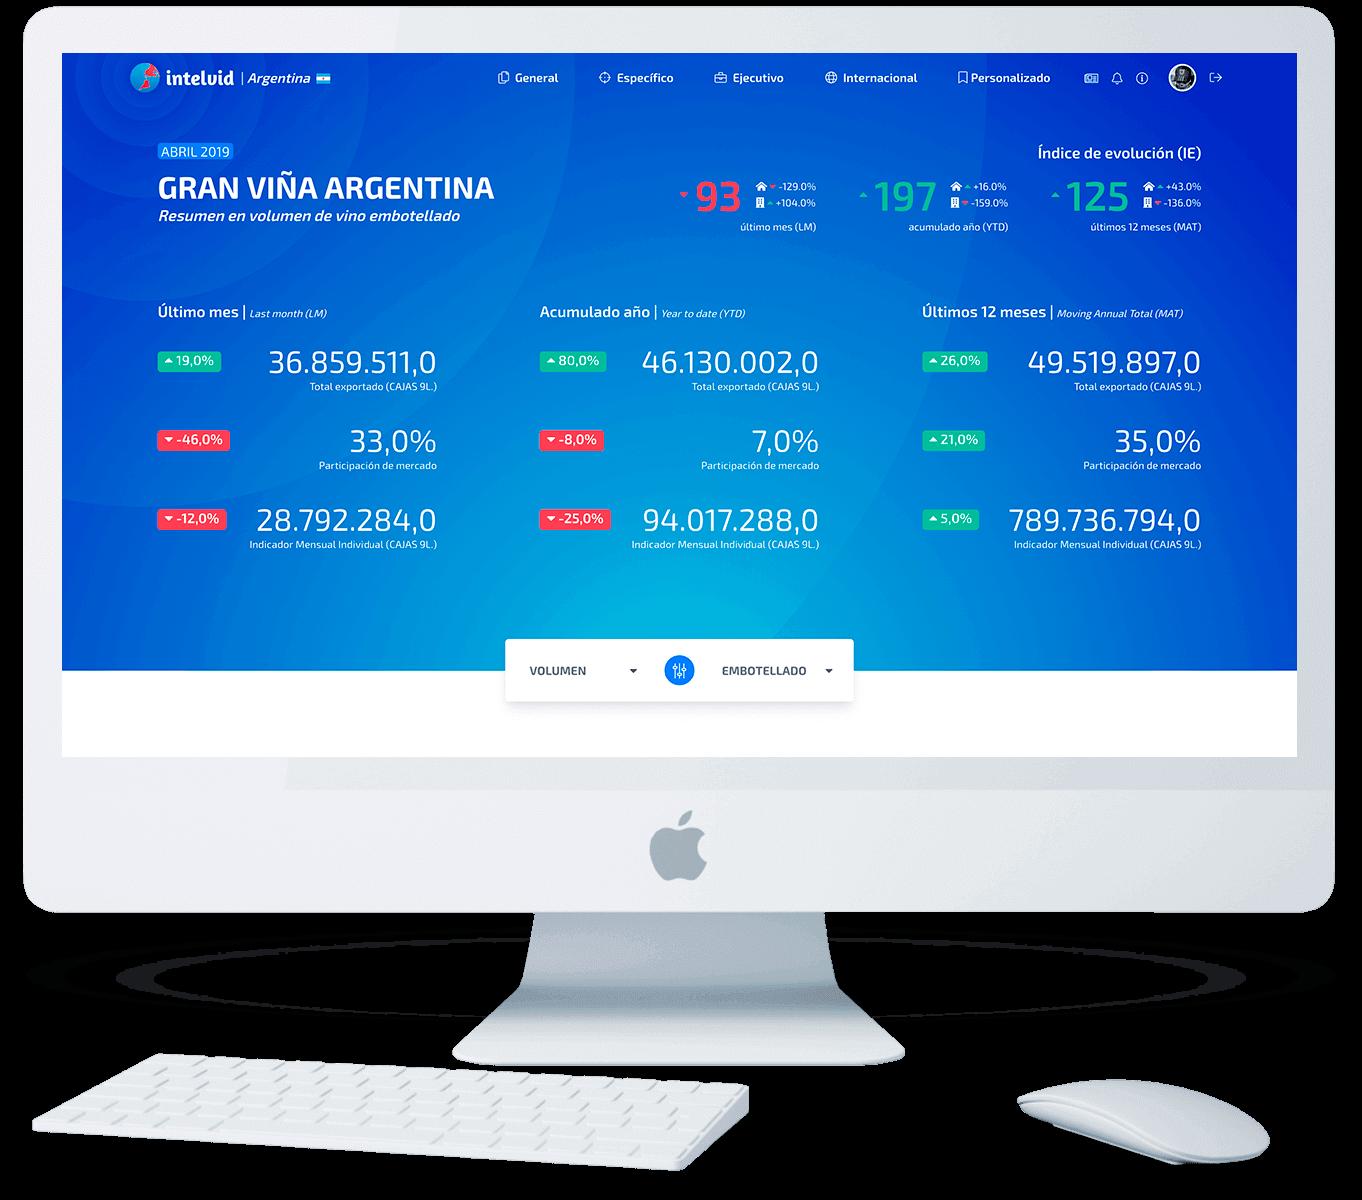 Dashboard Intelvid Argentina